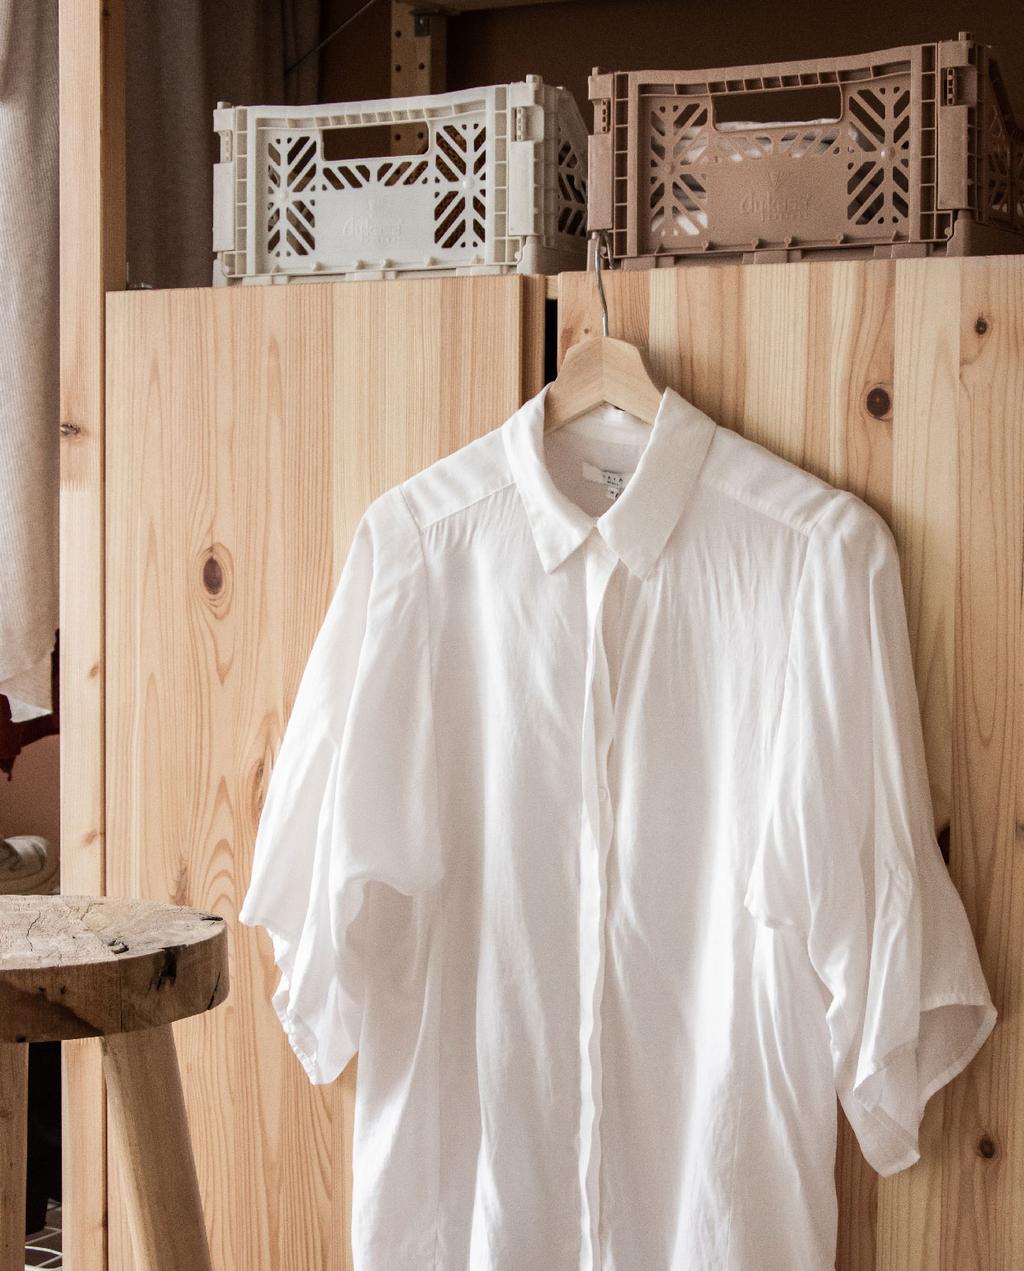 vtwonen blog rachel | open kledingkast ikea ivar diy witte bloes